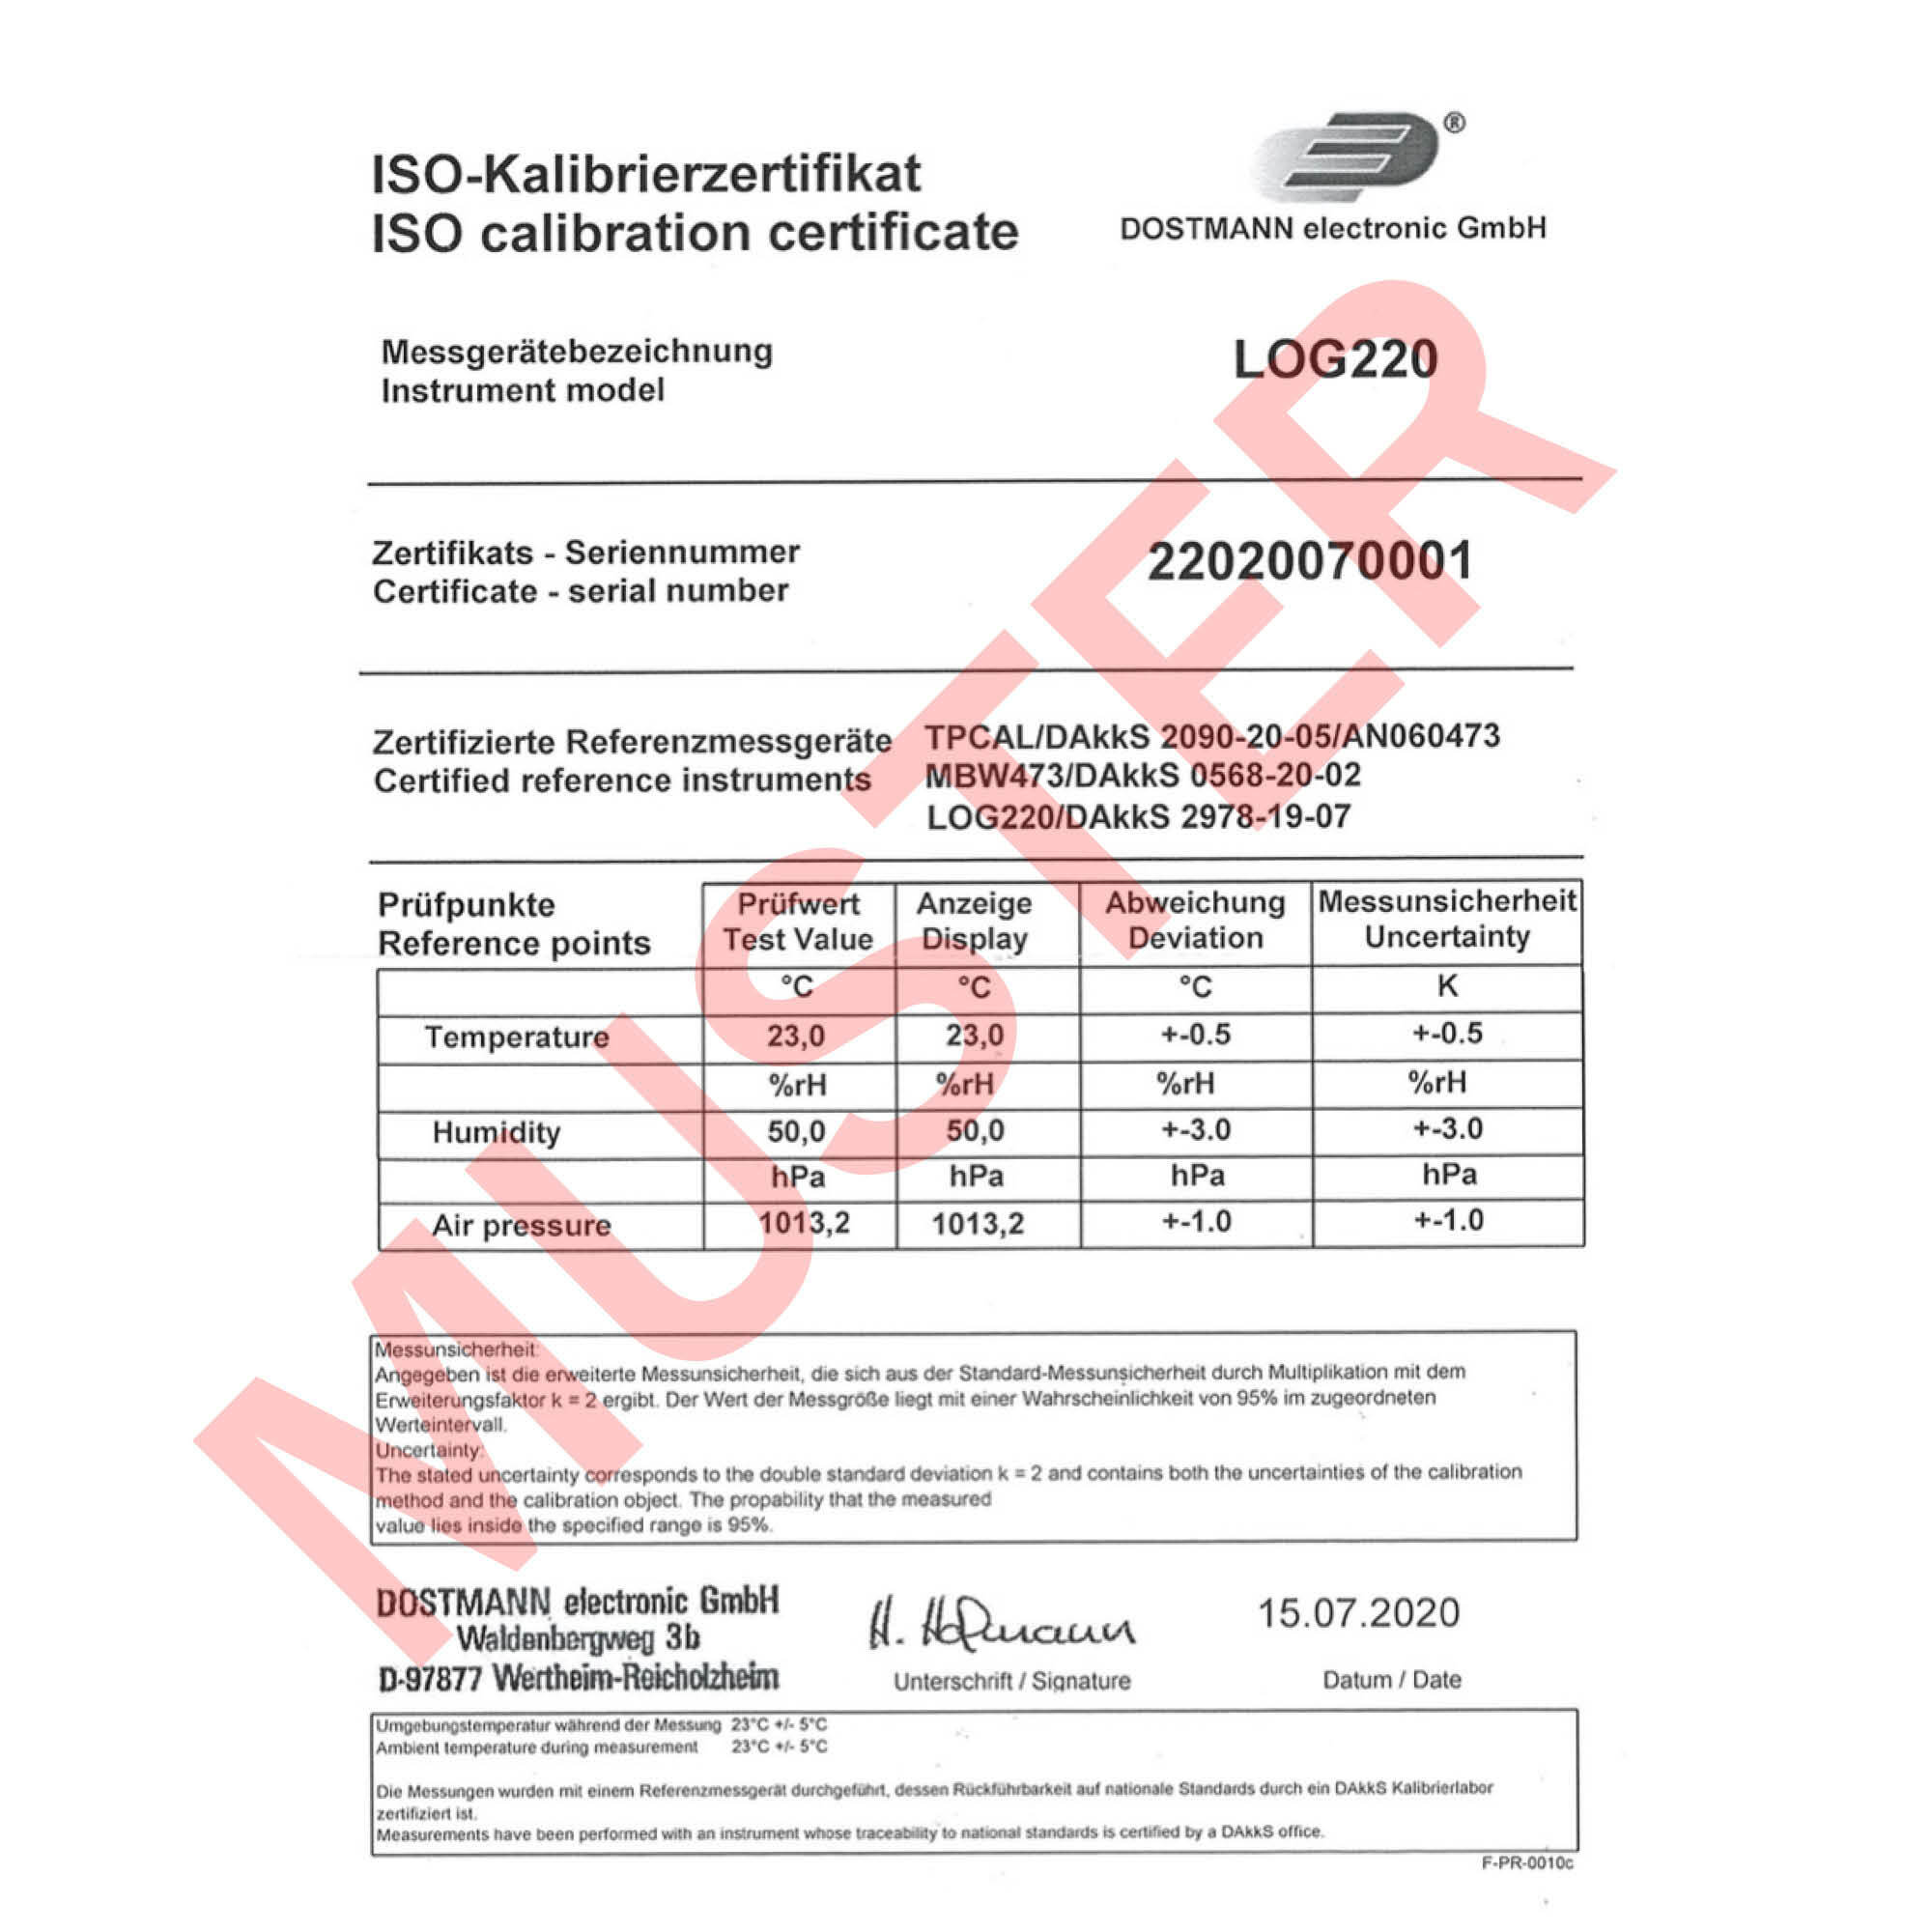 Zertifikat Muster Artikelnummer 311059.jpg